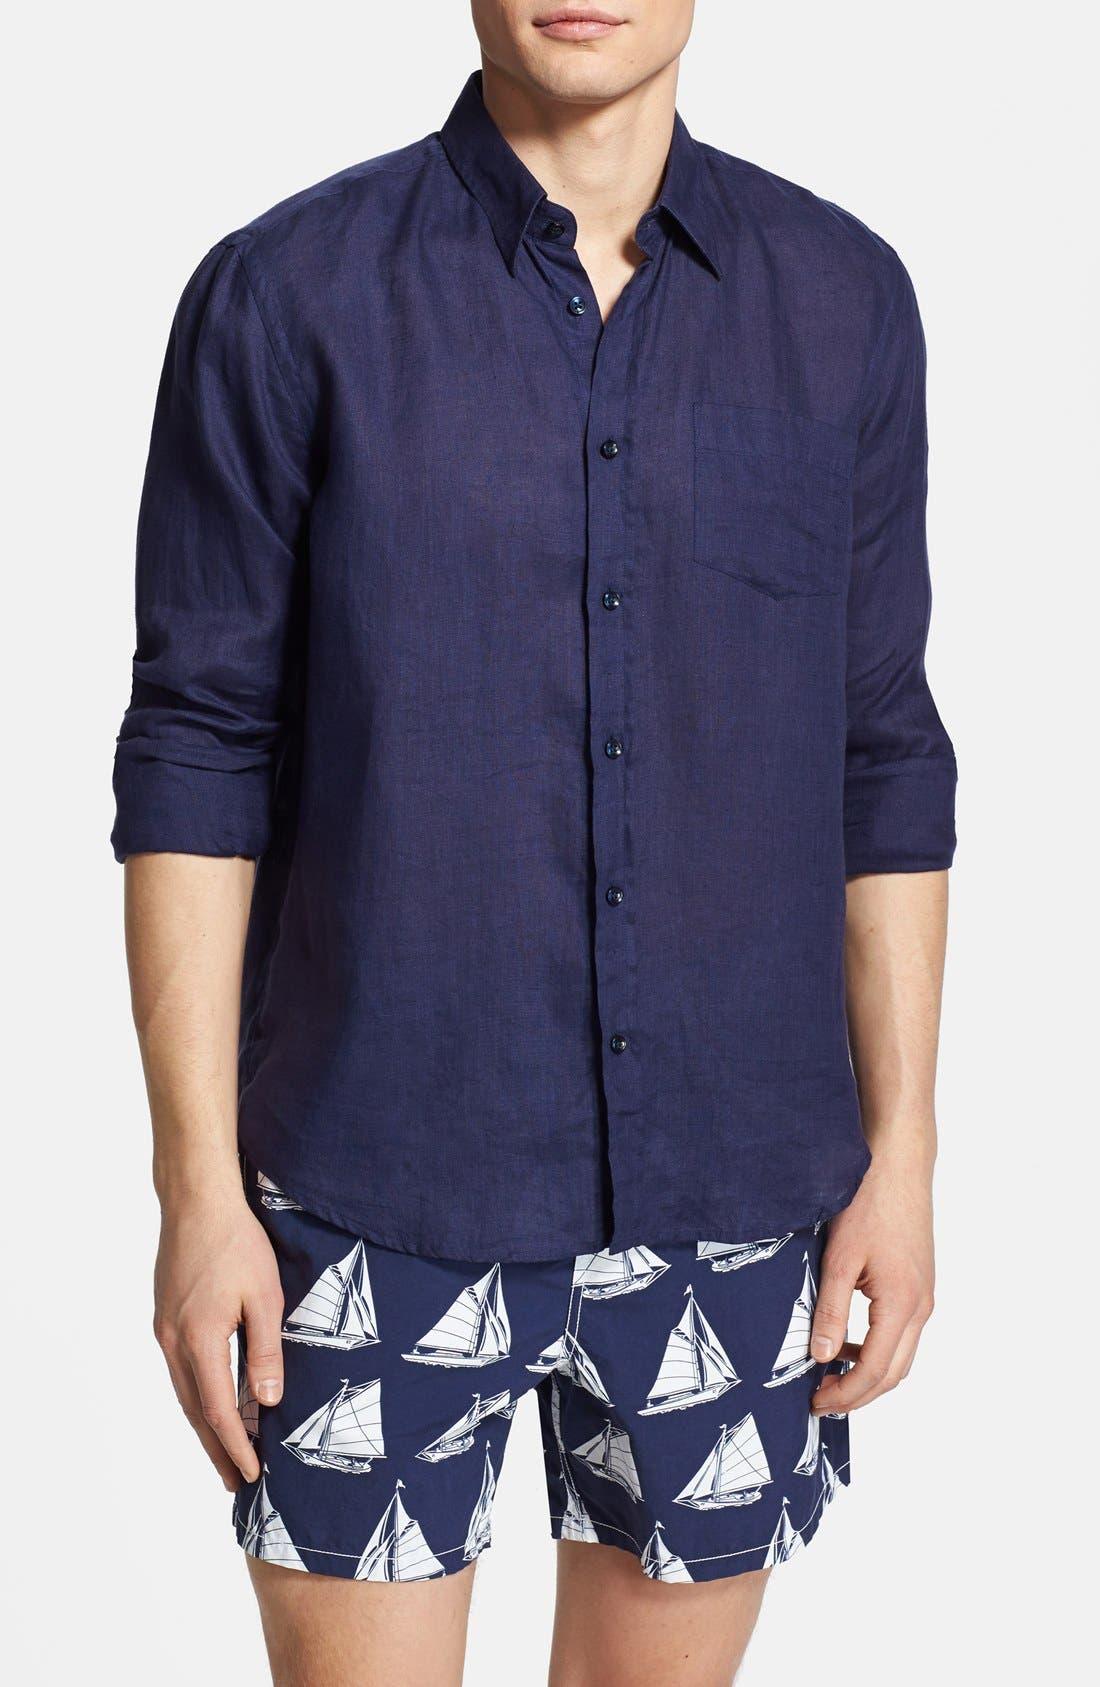 'Caroubier' Linen Shirt,                             Alternate thumbnail 53, color,